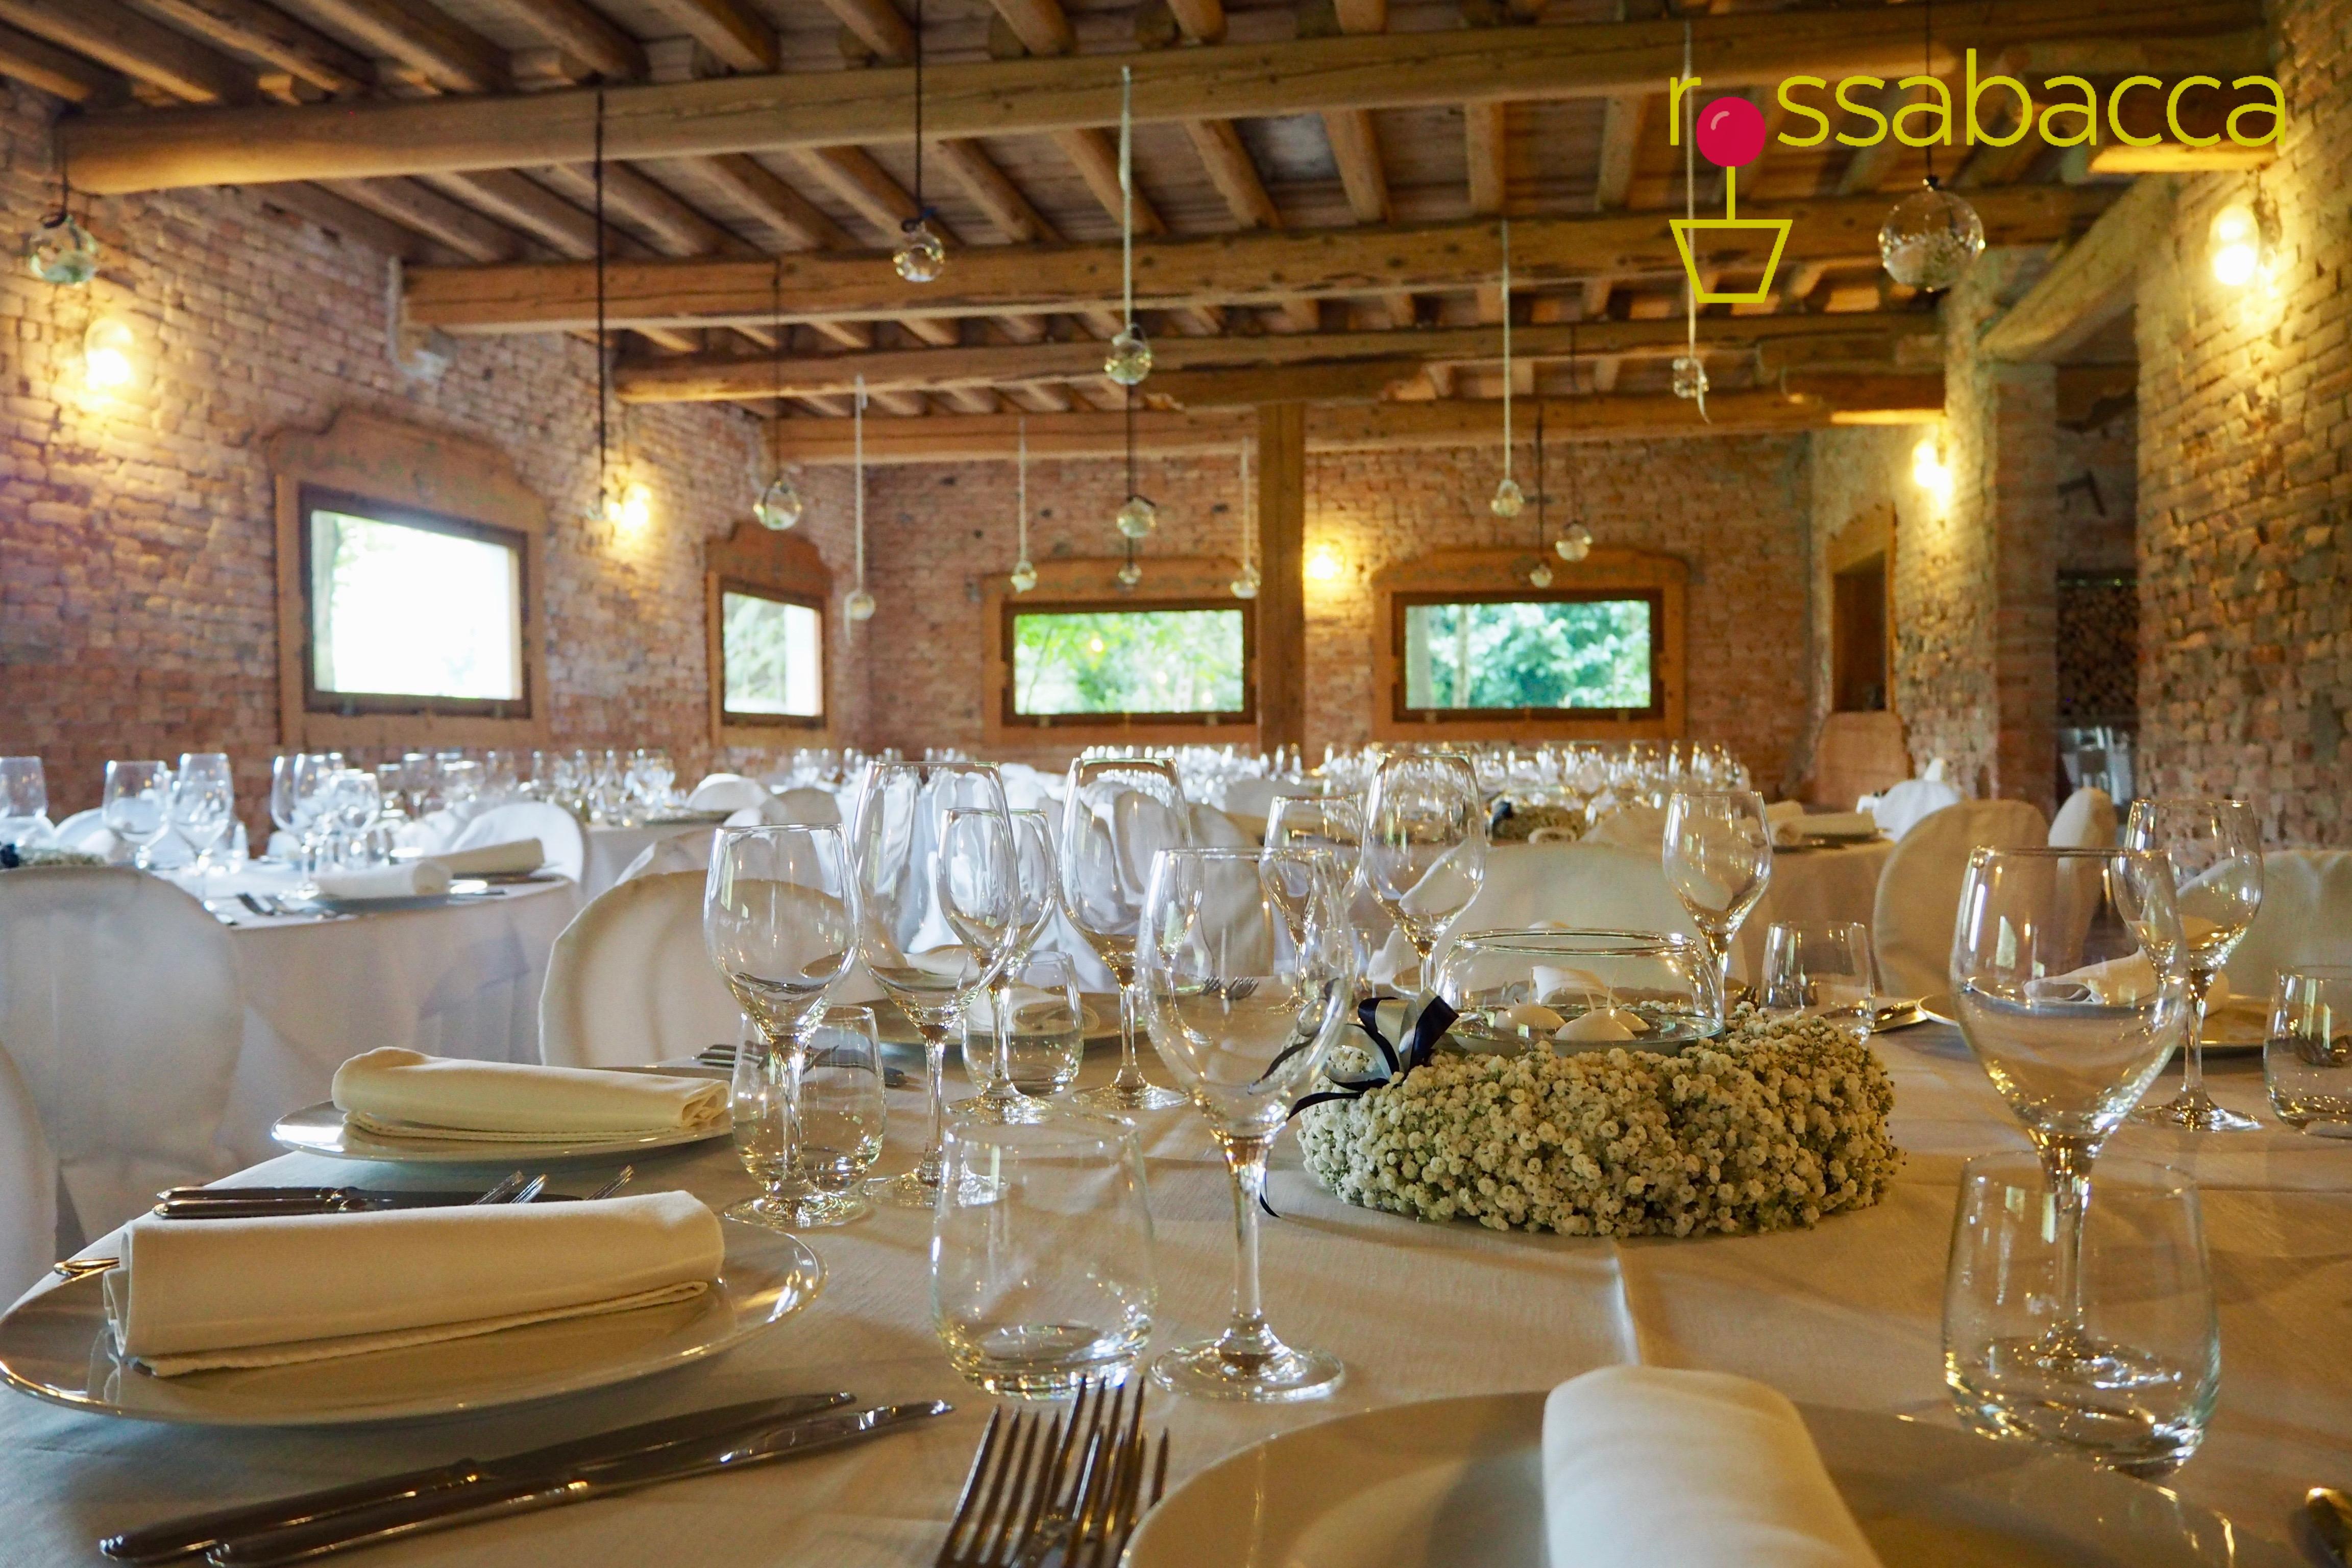 Tema Matrimonio Rosa Quarzo : Sfere floreali u2013 rossabacca